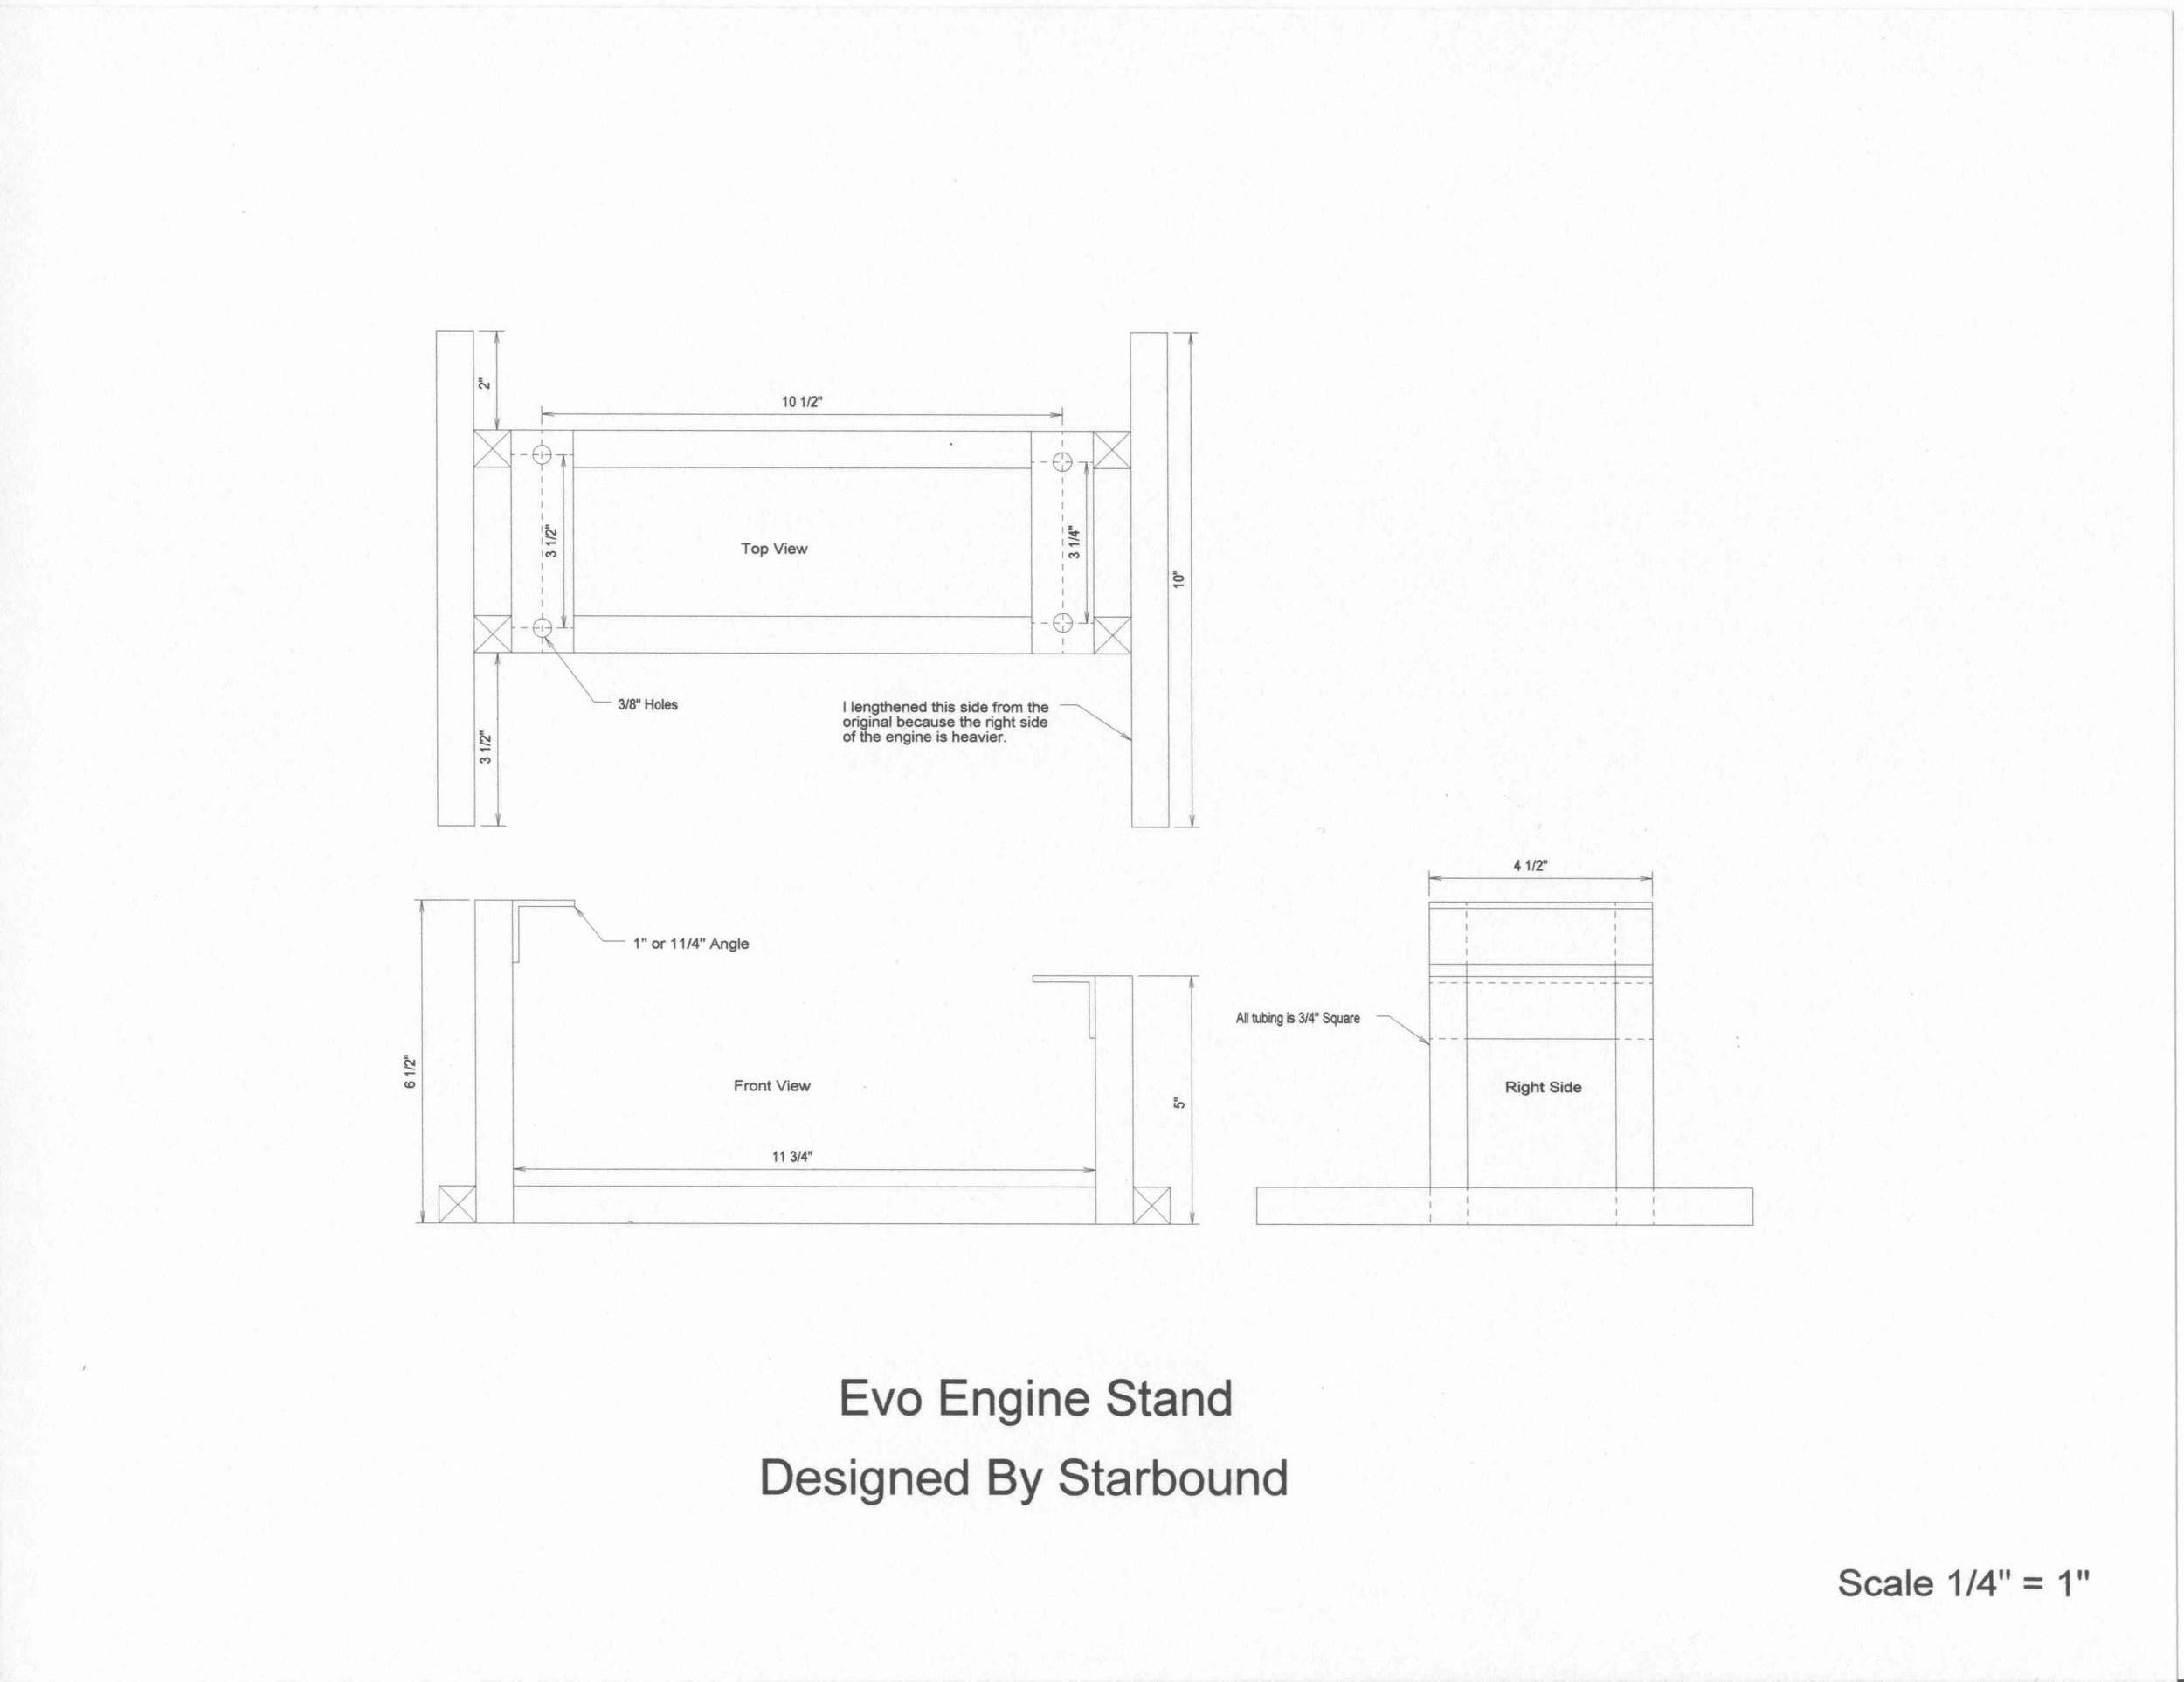 hight resolution of 80 harley evolution engine diagram wiring diagramplans for a harley motor stand u2013 mustaribrandharley